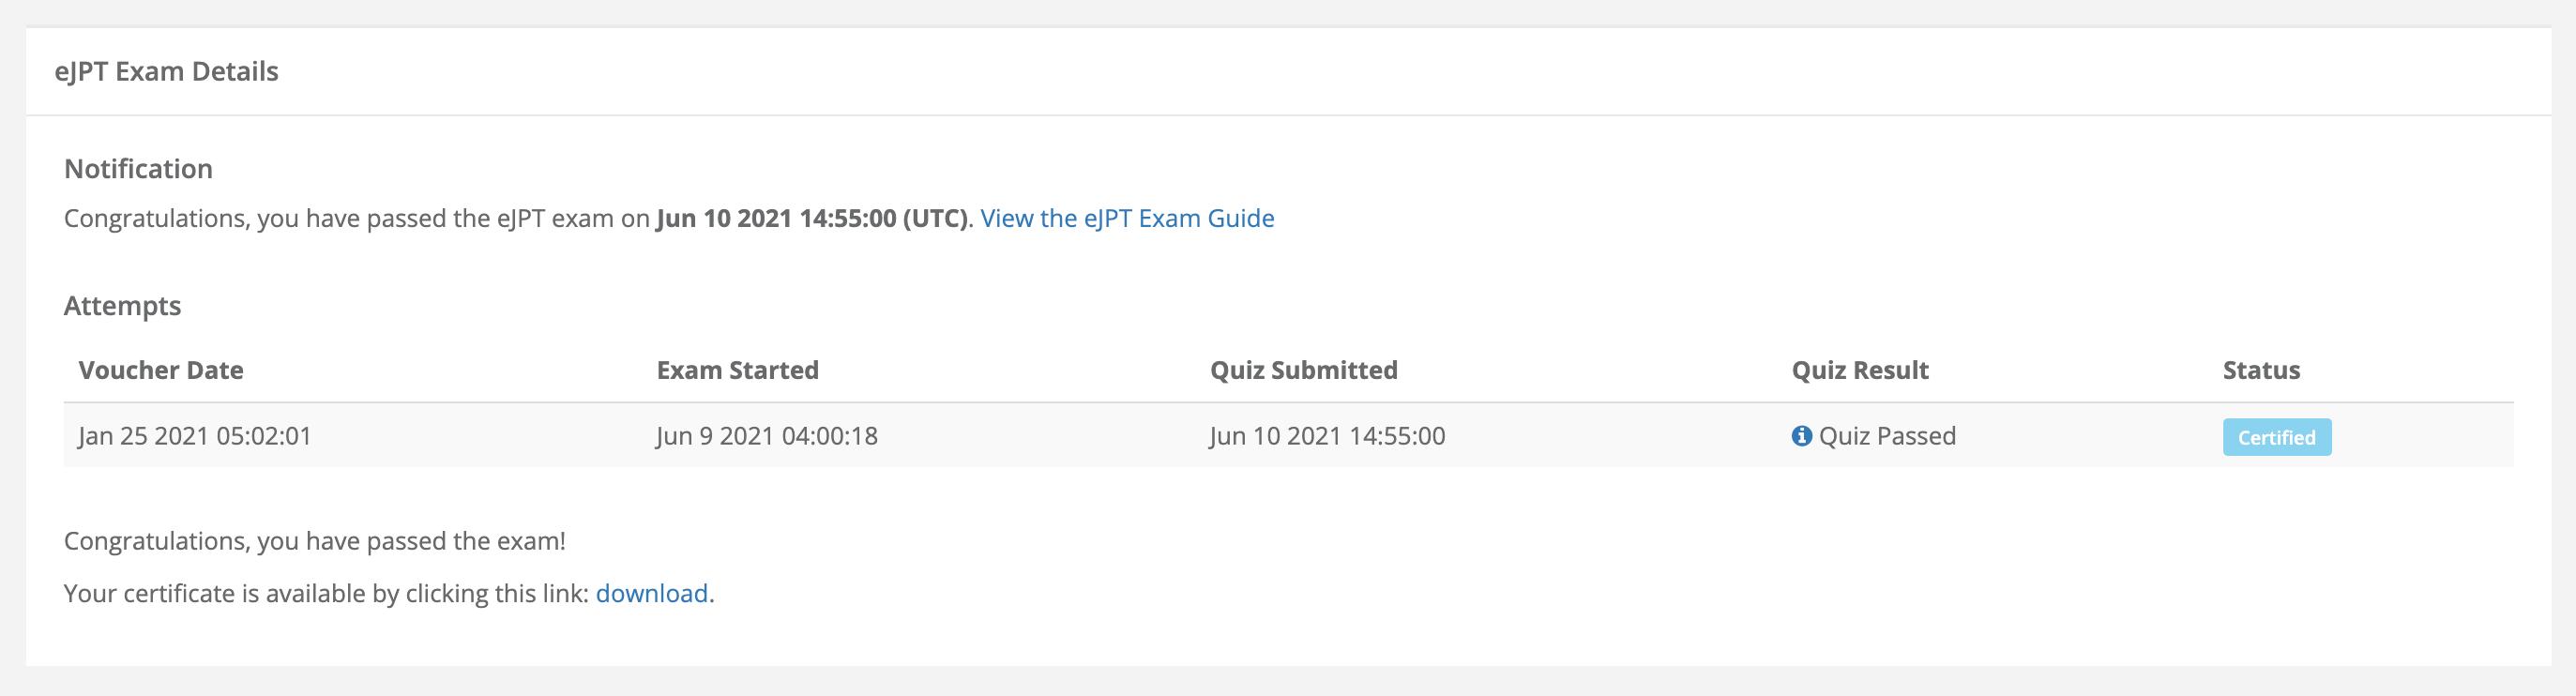 eJPT Exam Details.png